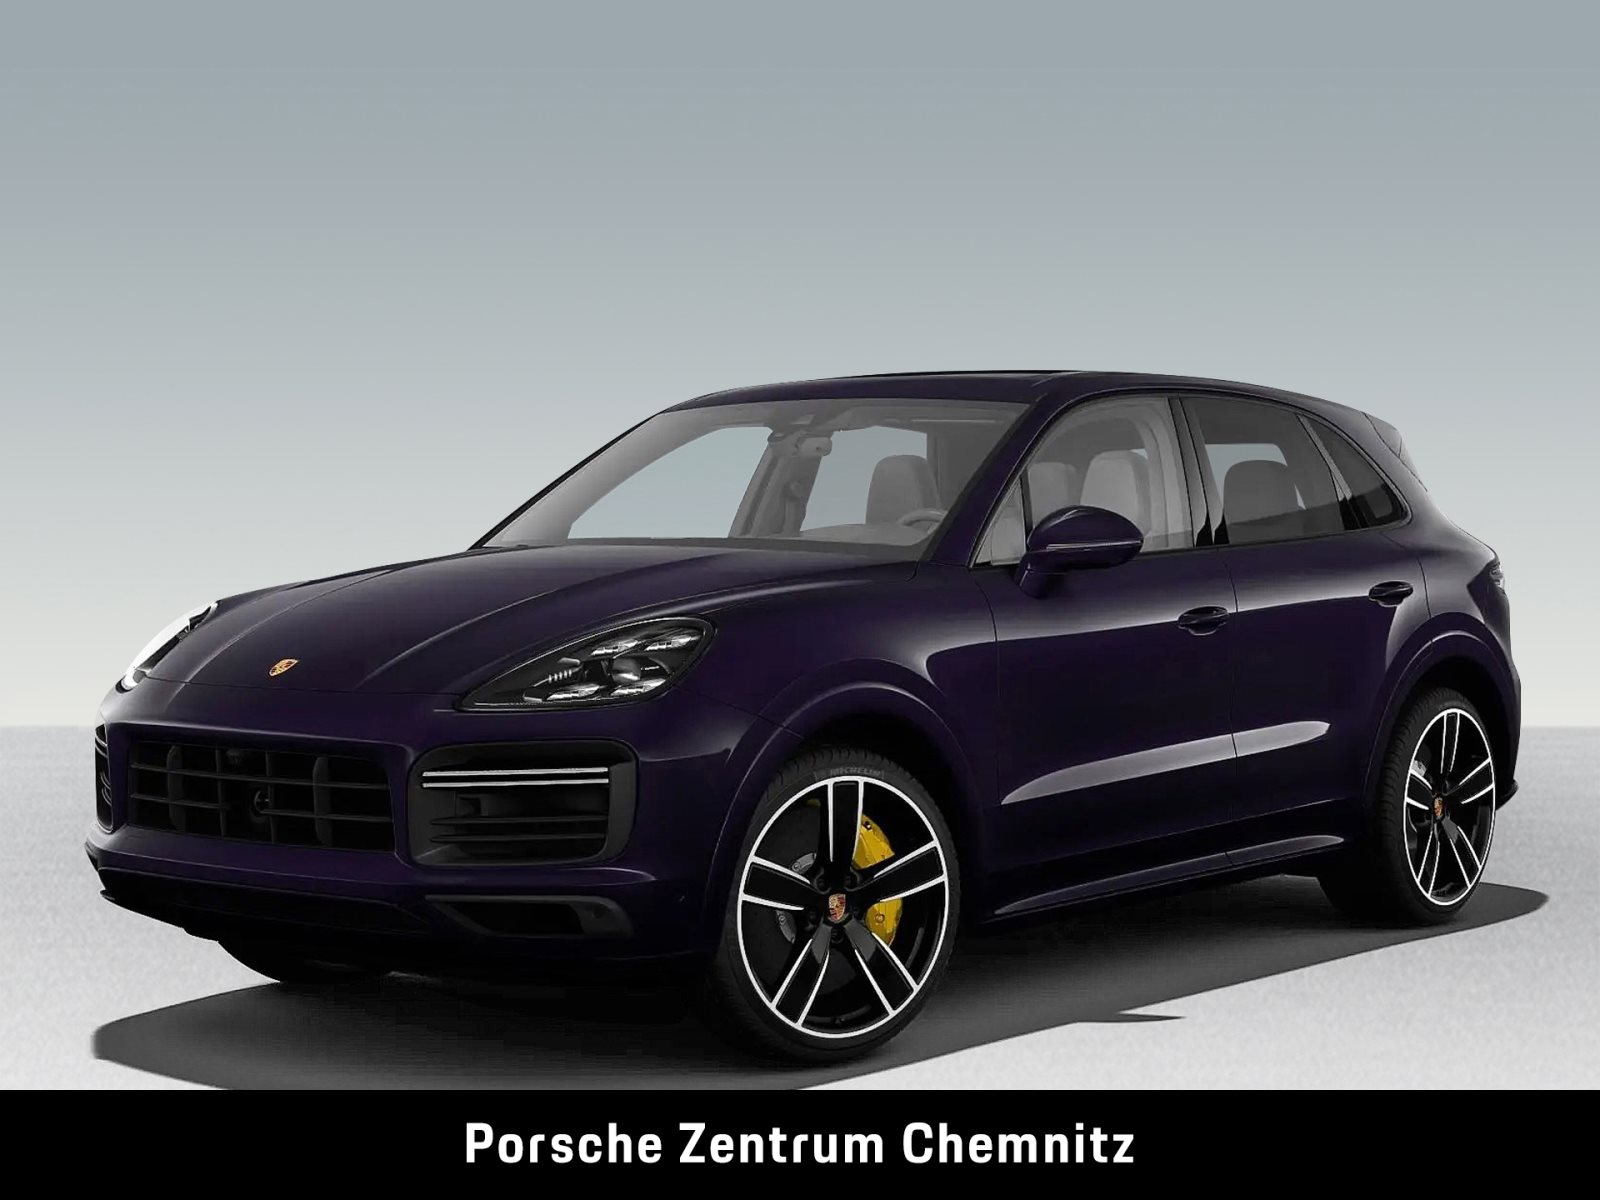 Porsche Cayenne Turbo VOLL!360°,PCCB,Sportabgas,Matrix,Burmester,InnoDrive (9YA)